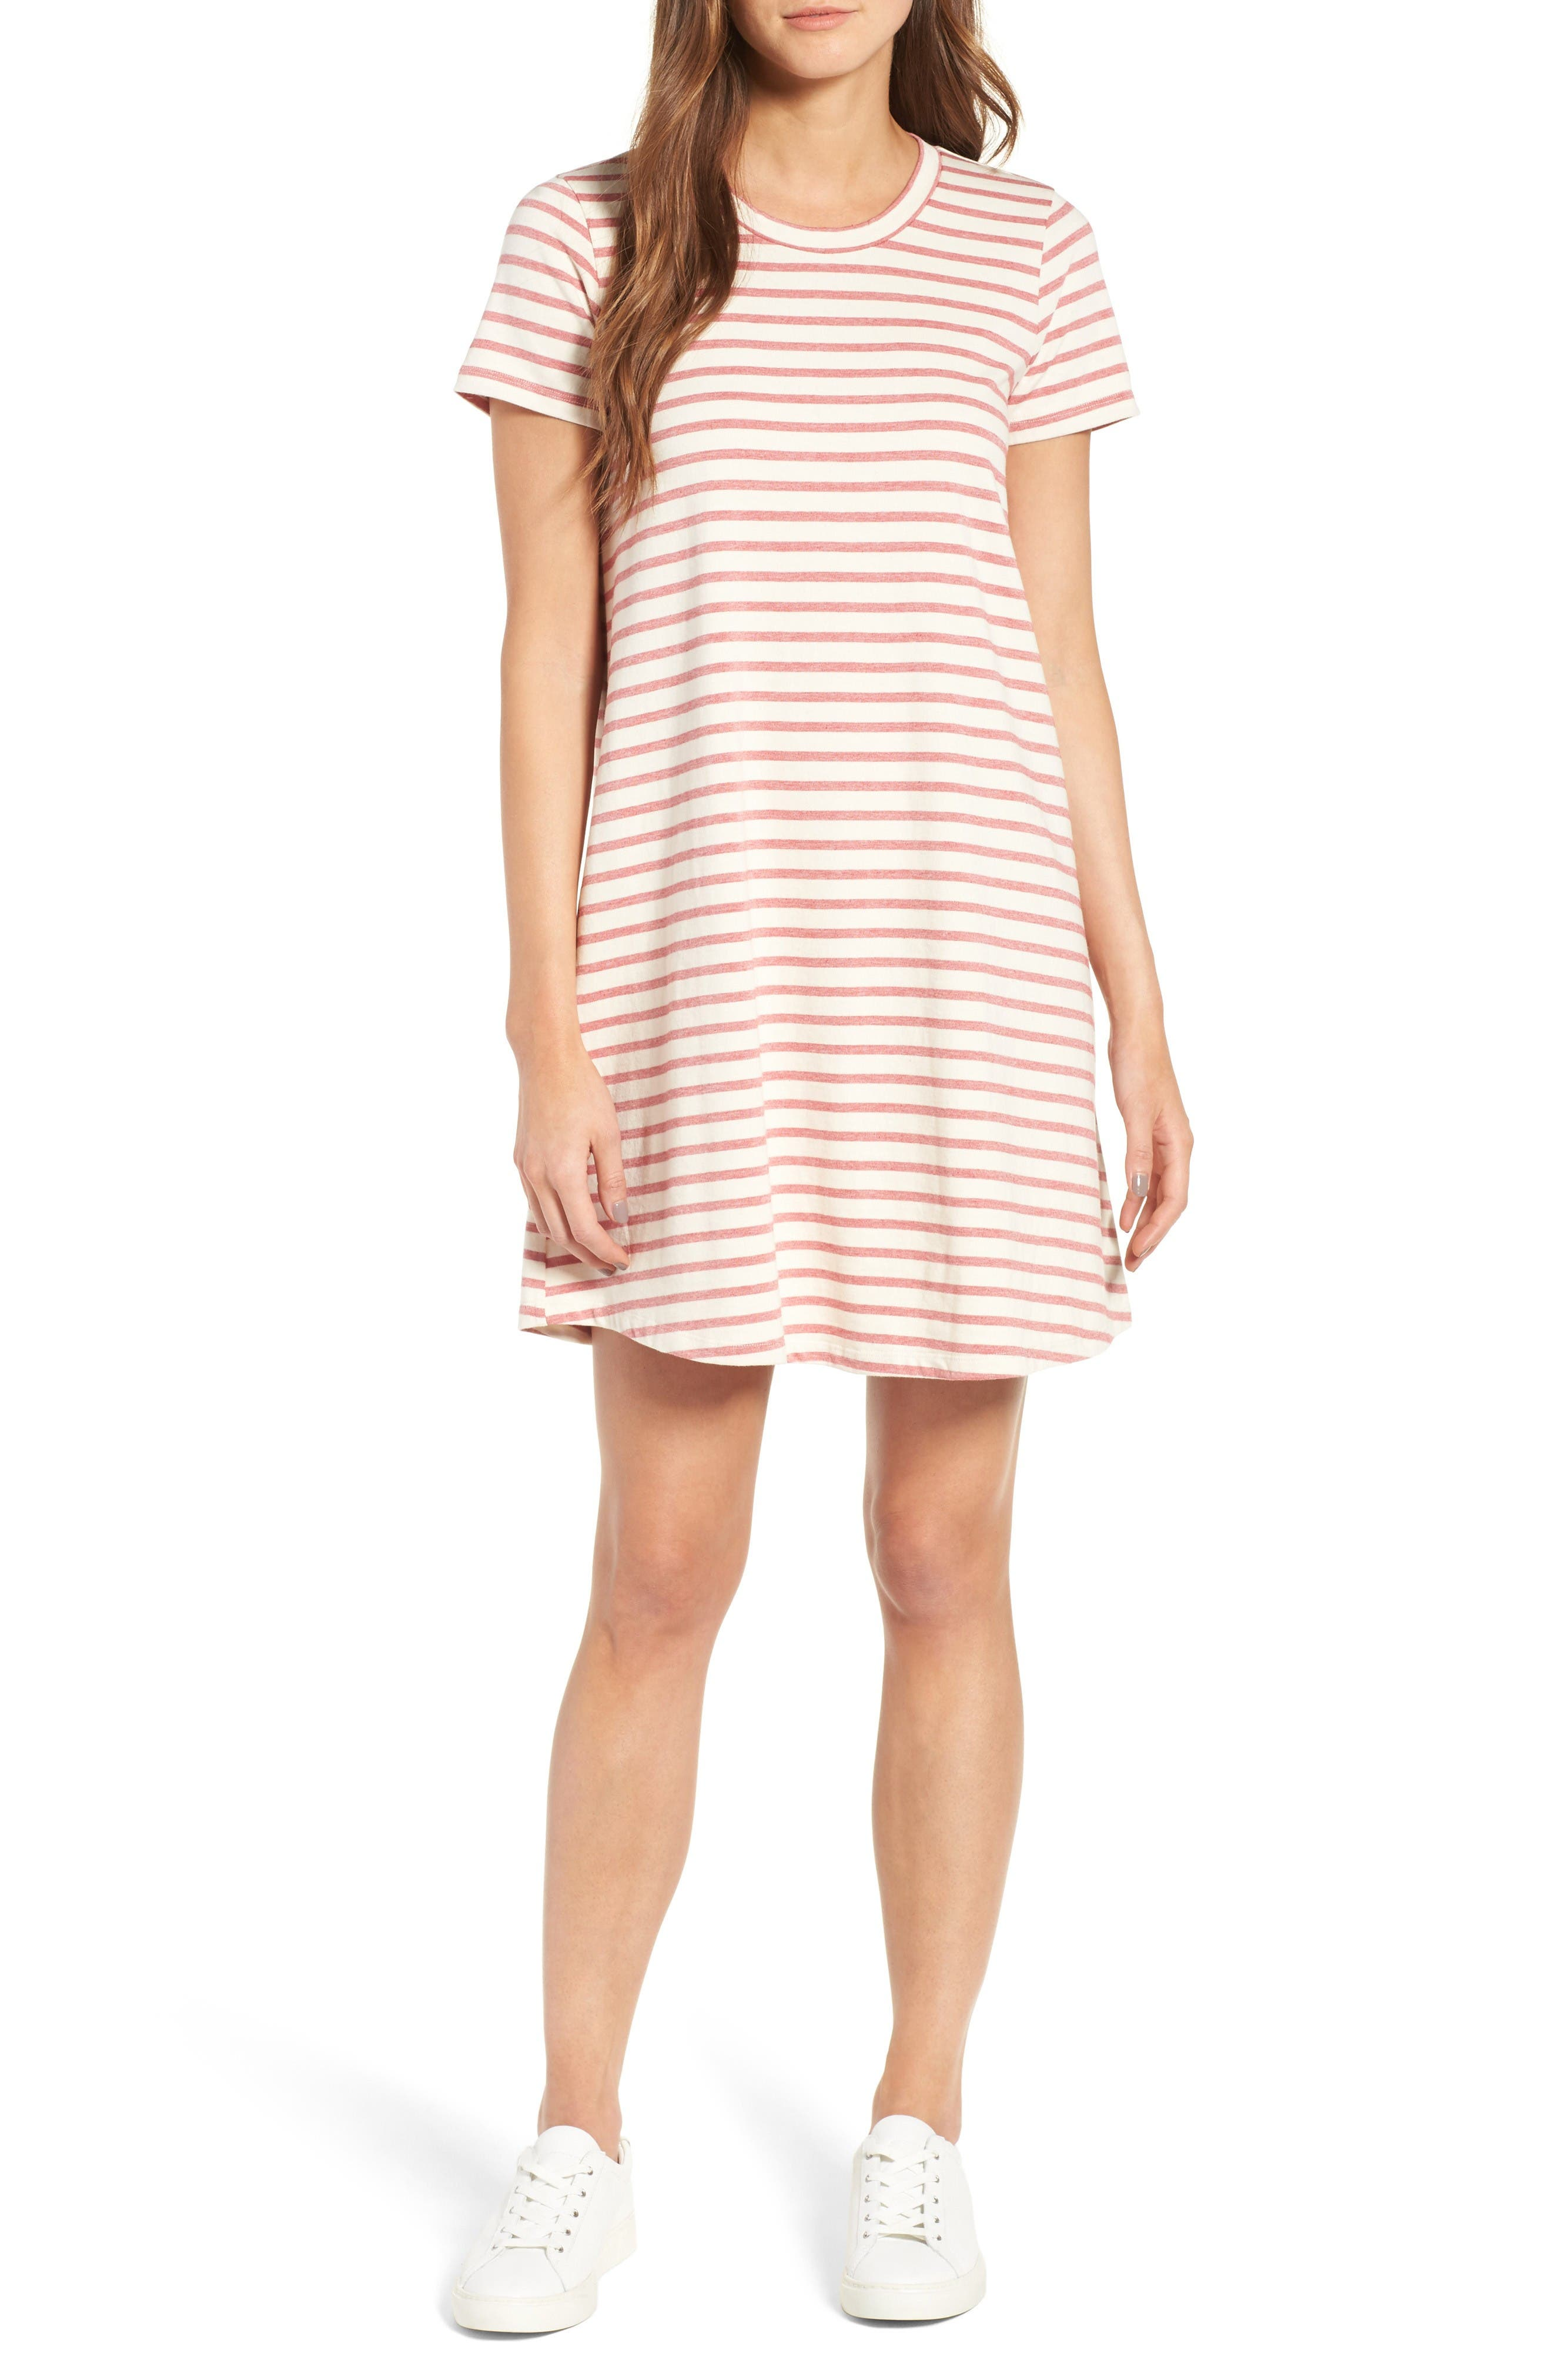 Madewell Retreat Stripe Cotton Shift Dress